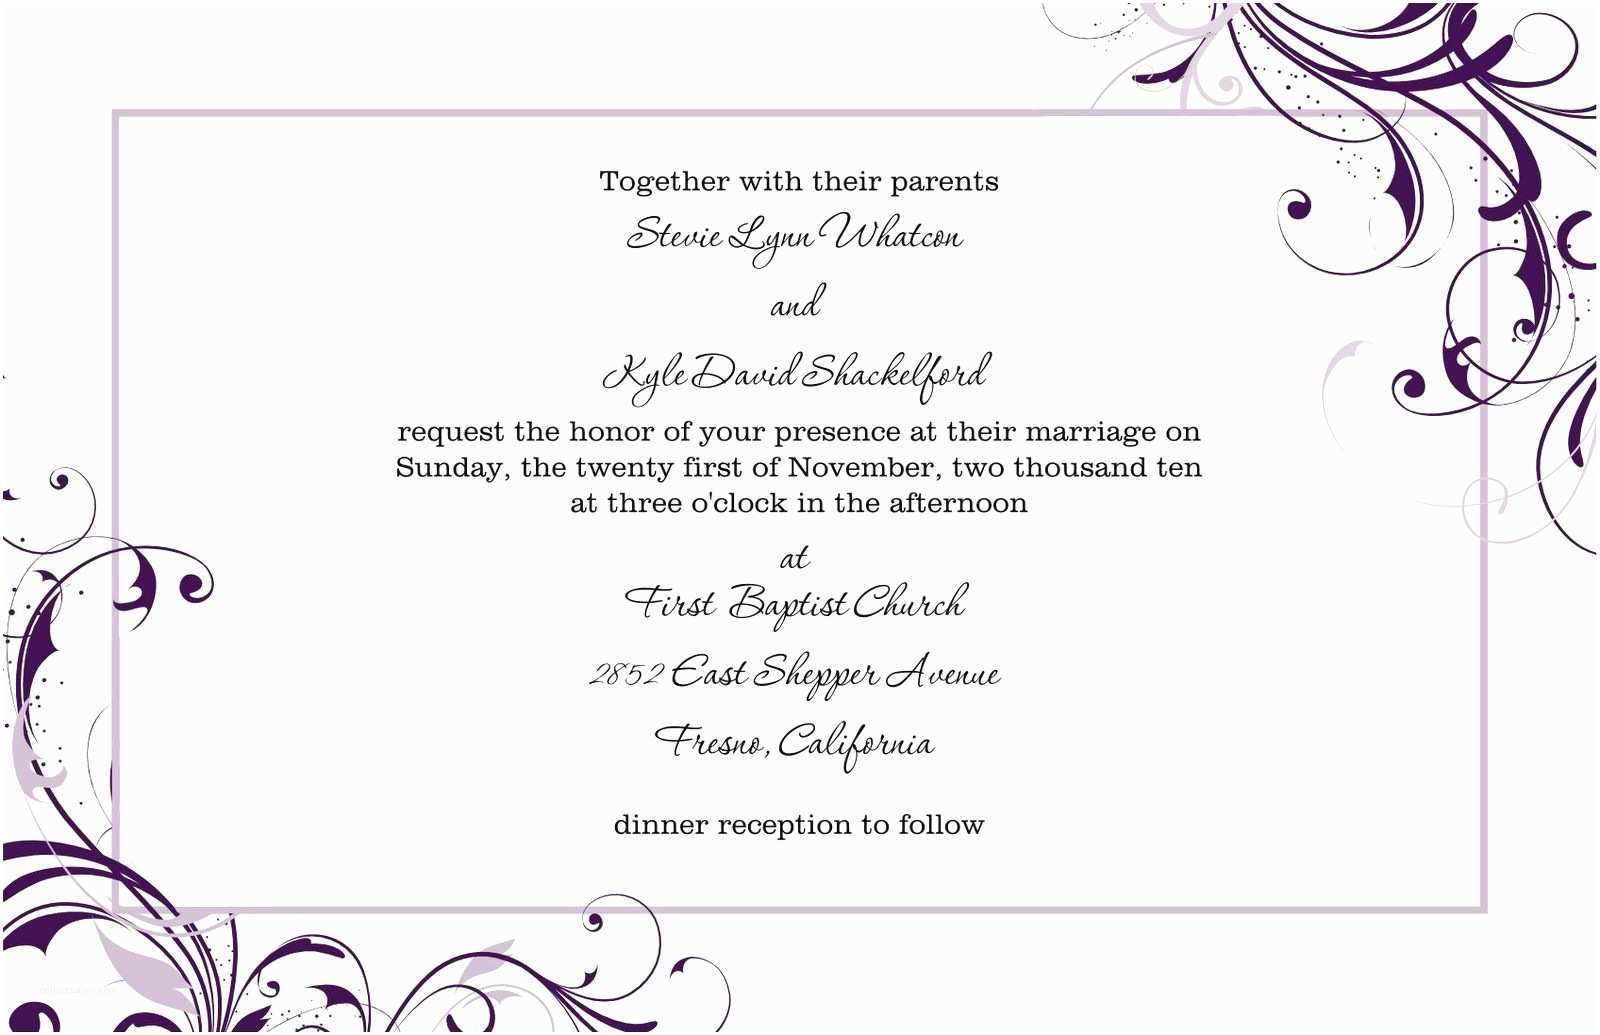 Free Printable Wedding Invitation Templates for Microsoft Word Free Blank Wedding Invitation Templates for Microsoft Word